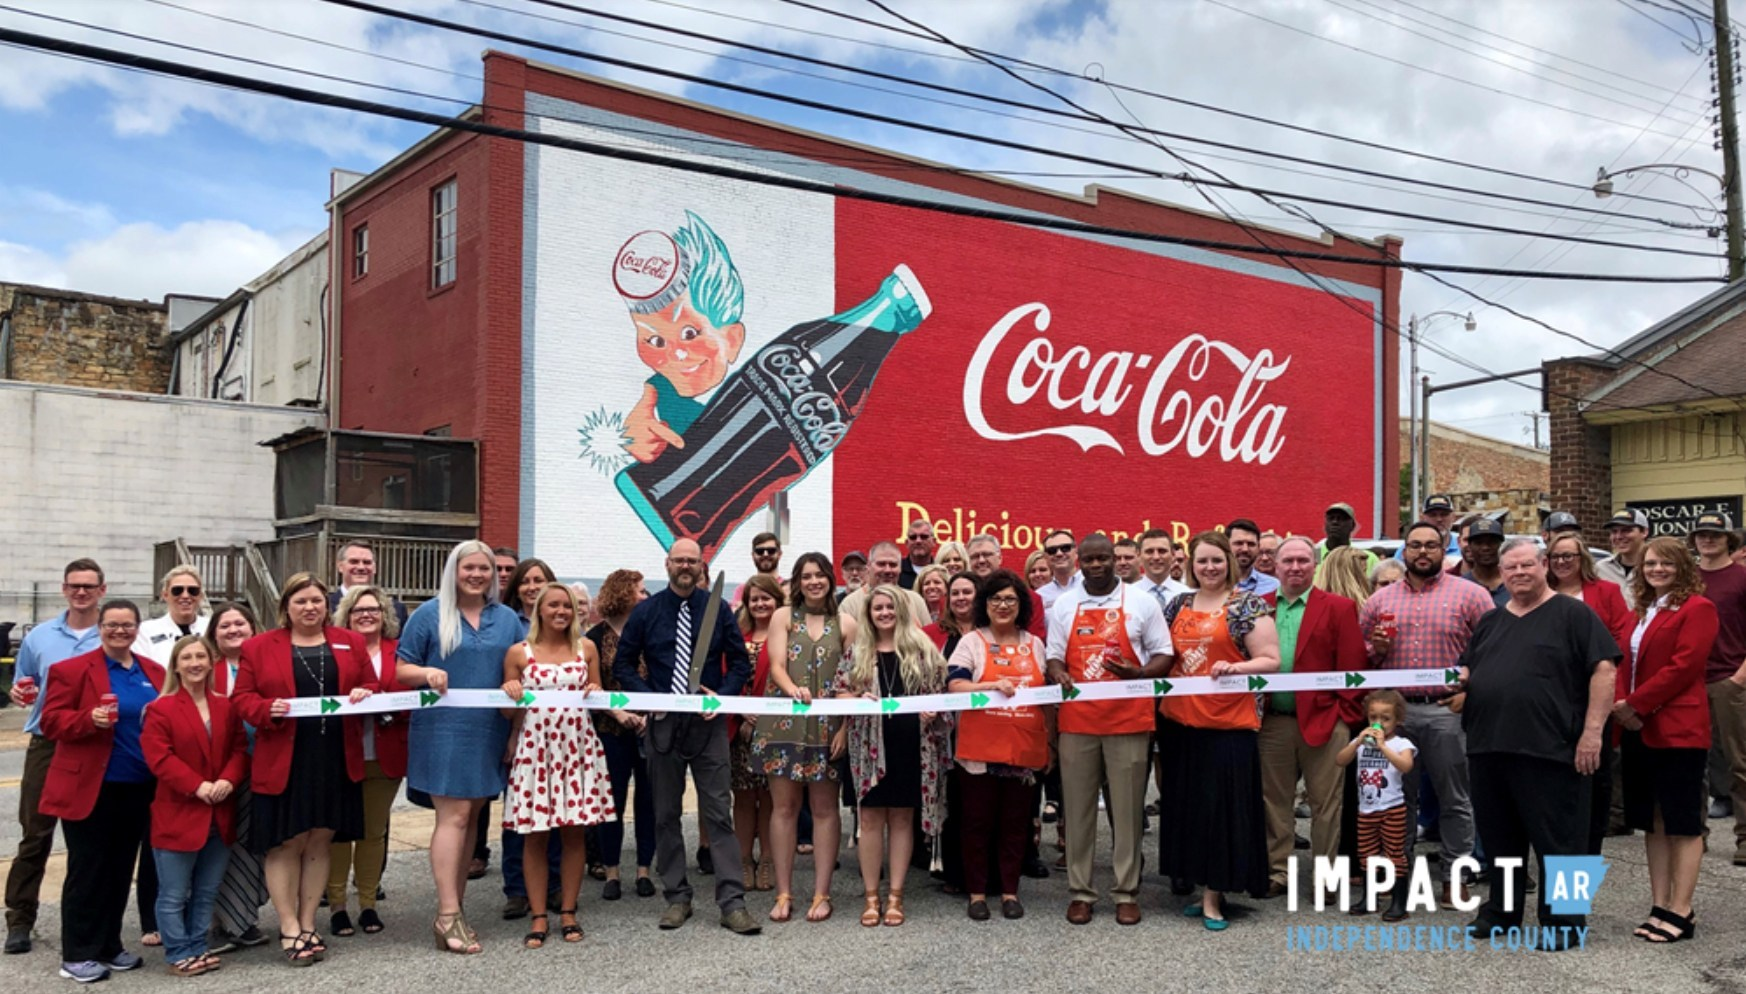 Coca-Cola-mural-ribbon-cutting.jpg